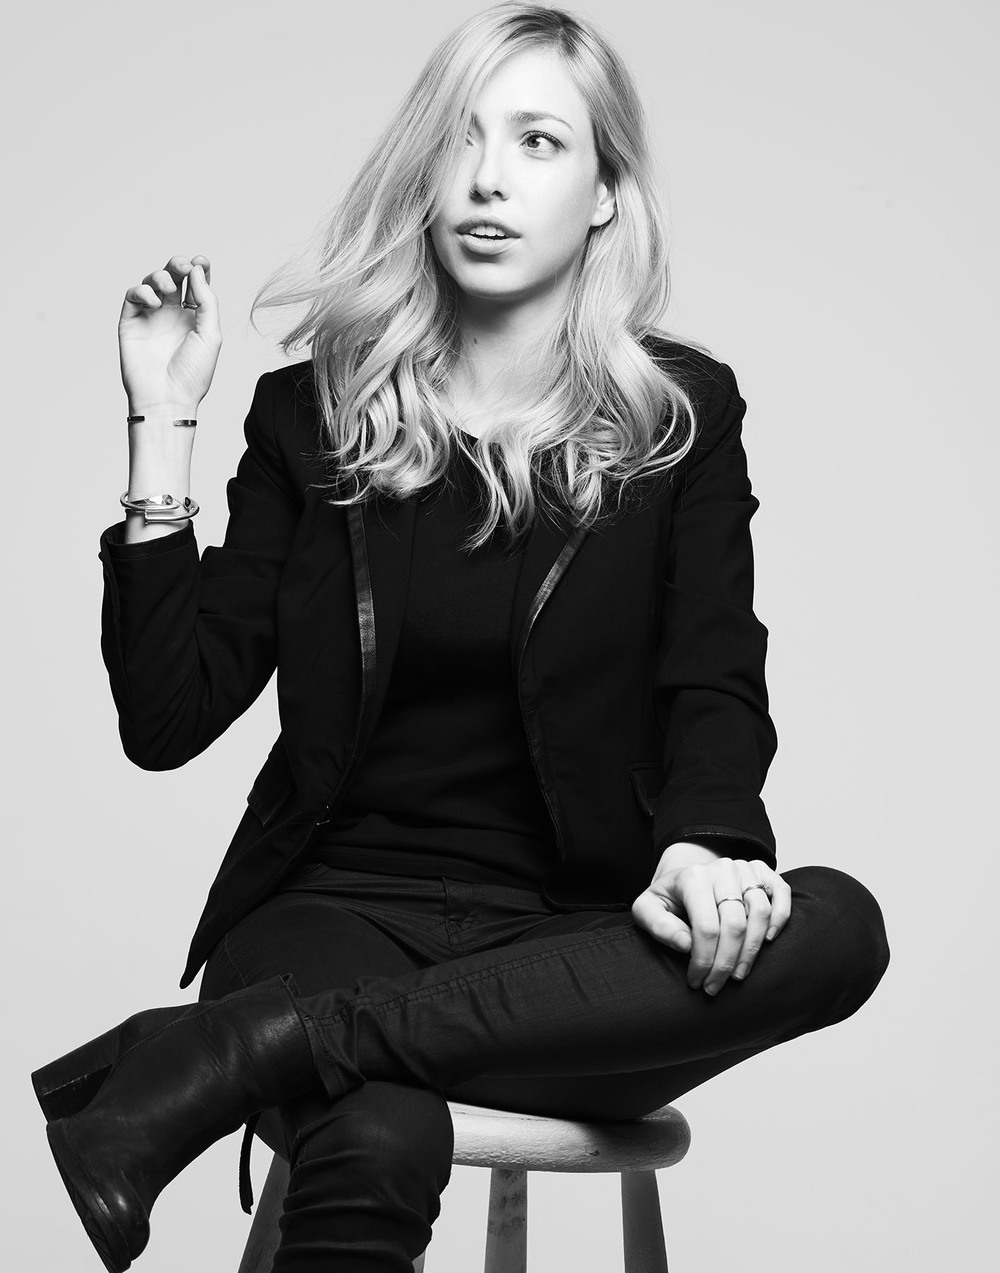 Sarah Bassett / Artist